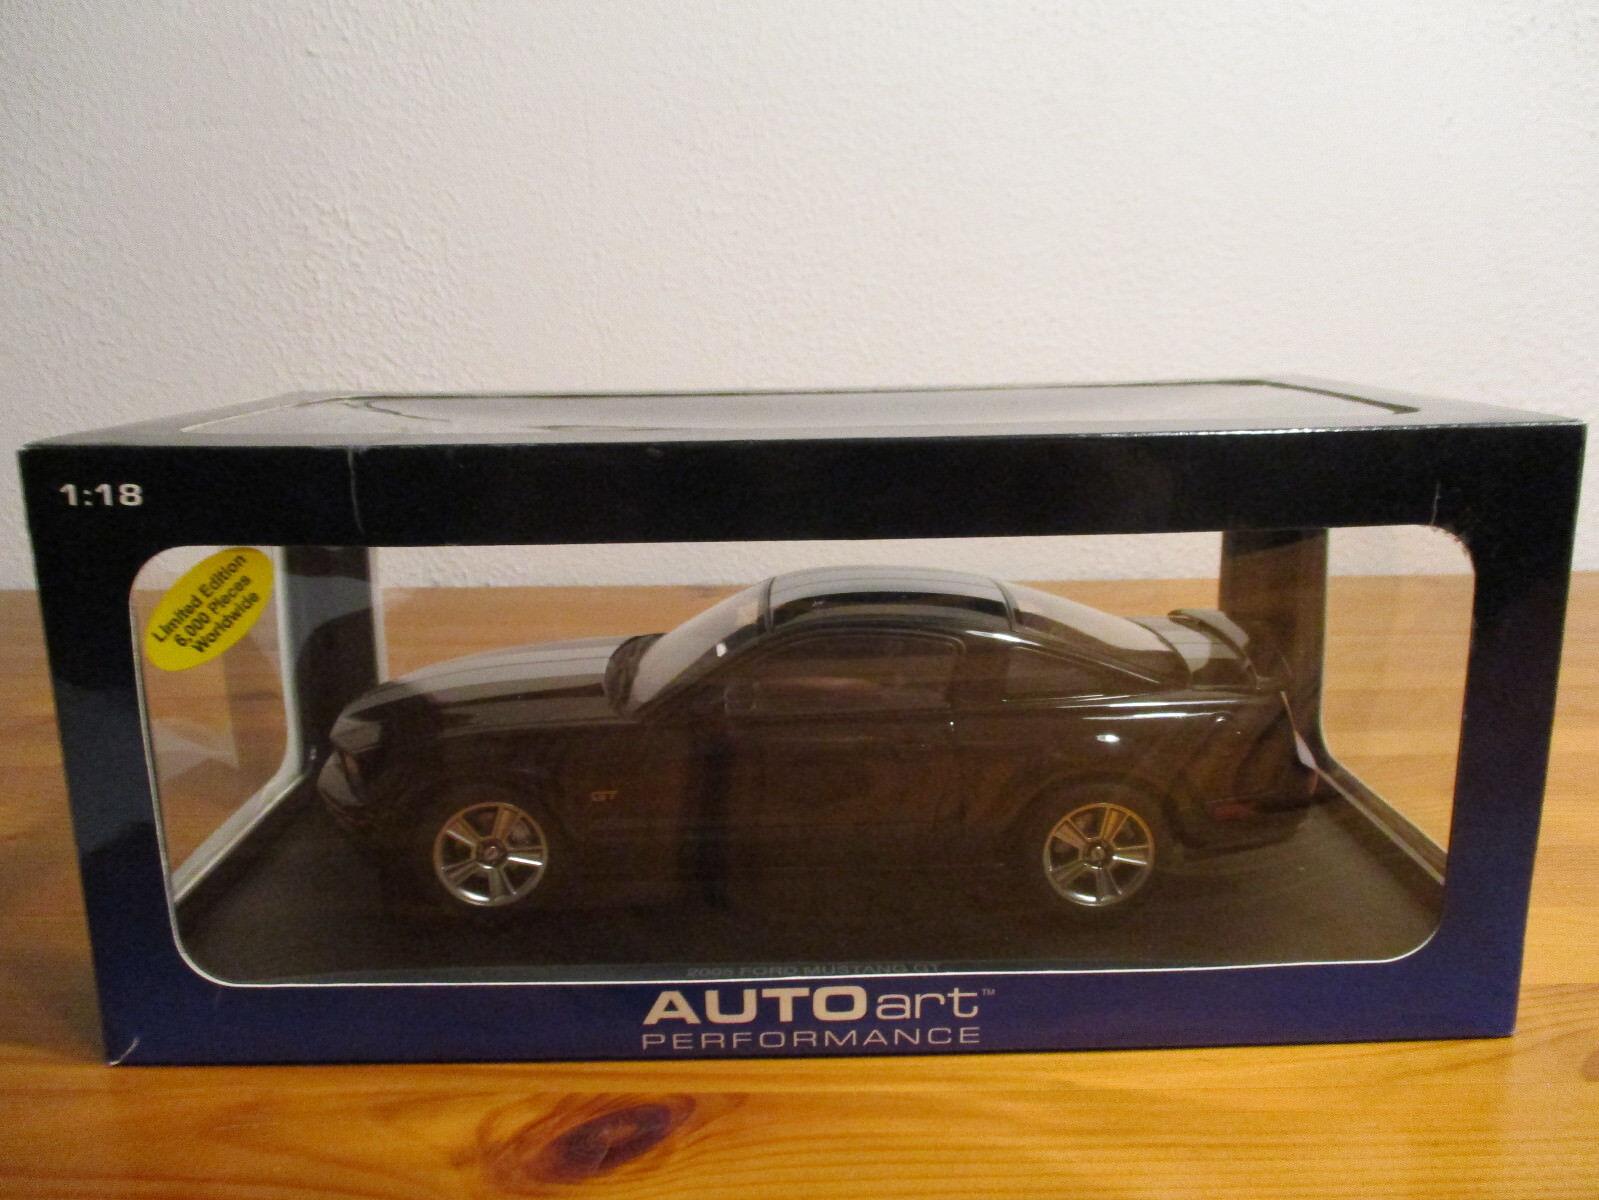 (gor) 1 18 Autoart Ford Mustang GT  nouveau OVP  limite acheter